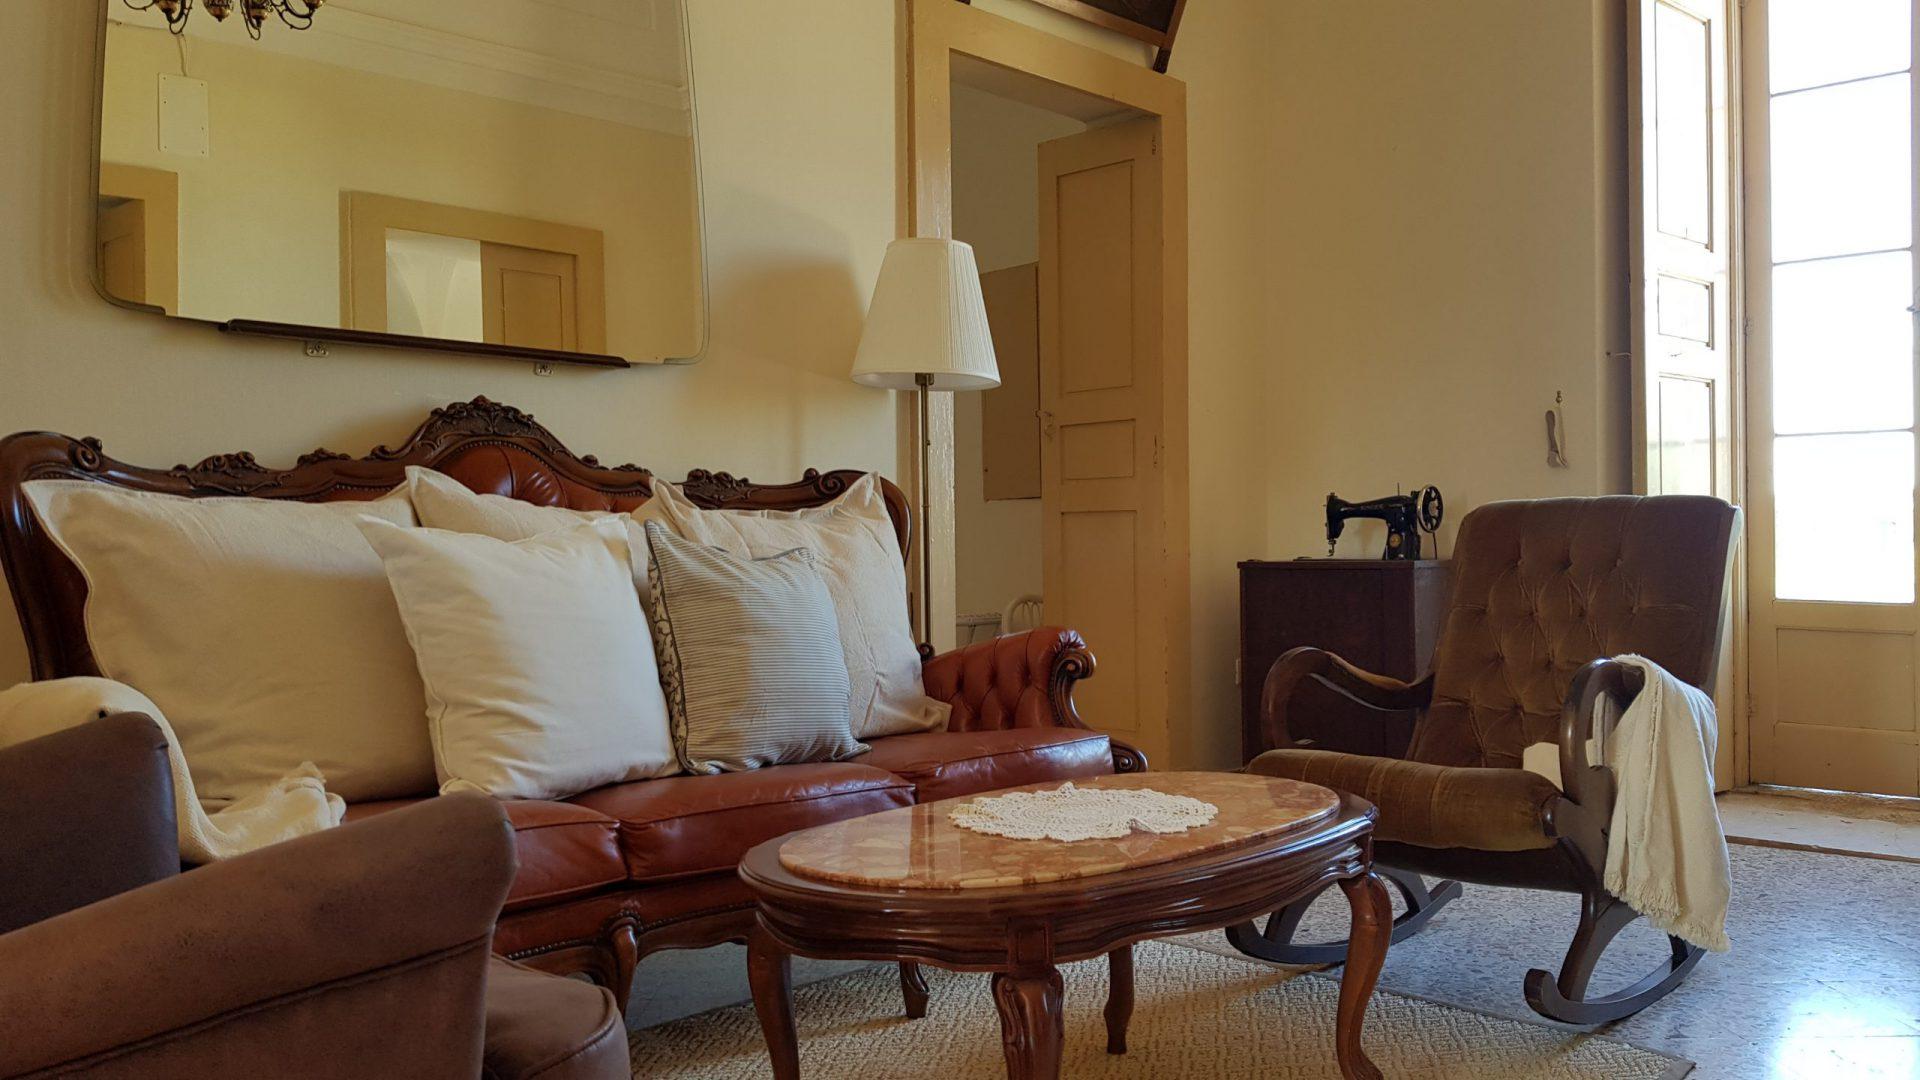 Living room in Masseria Bellavista Ostuni Vacation holiday rental villa in Puglia with pool and seaview